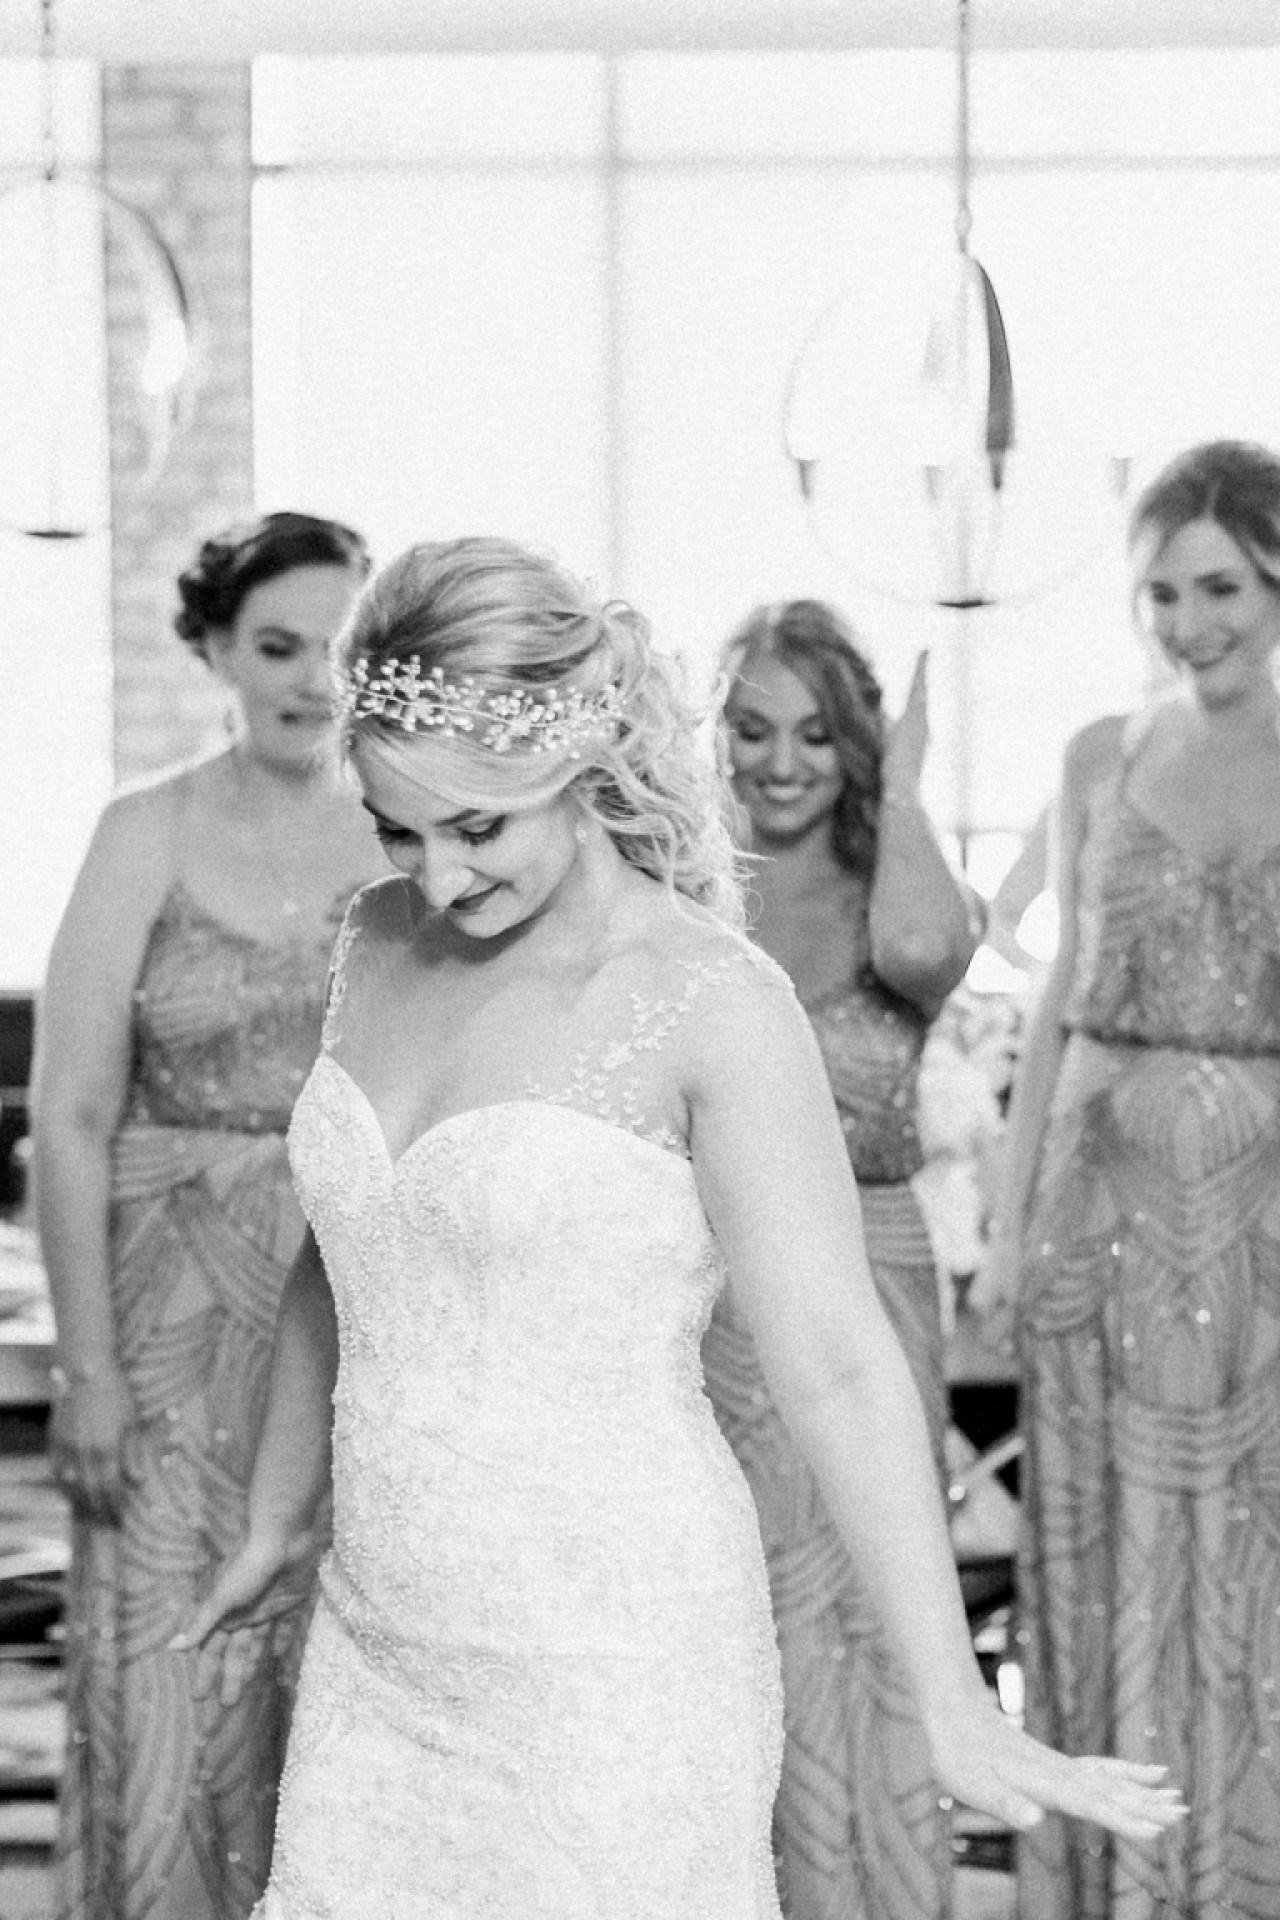 Traverse City Michigan Wedding Photographer | The Weber Photographers | Cory Weber